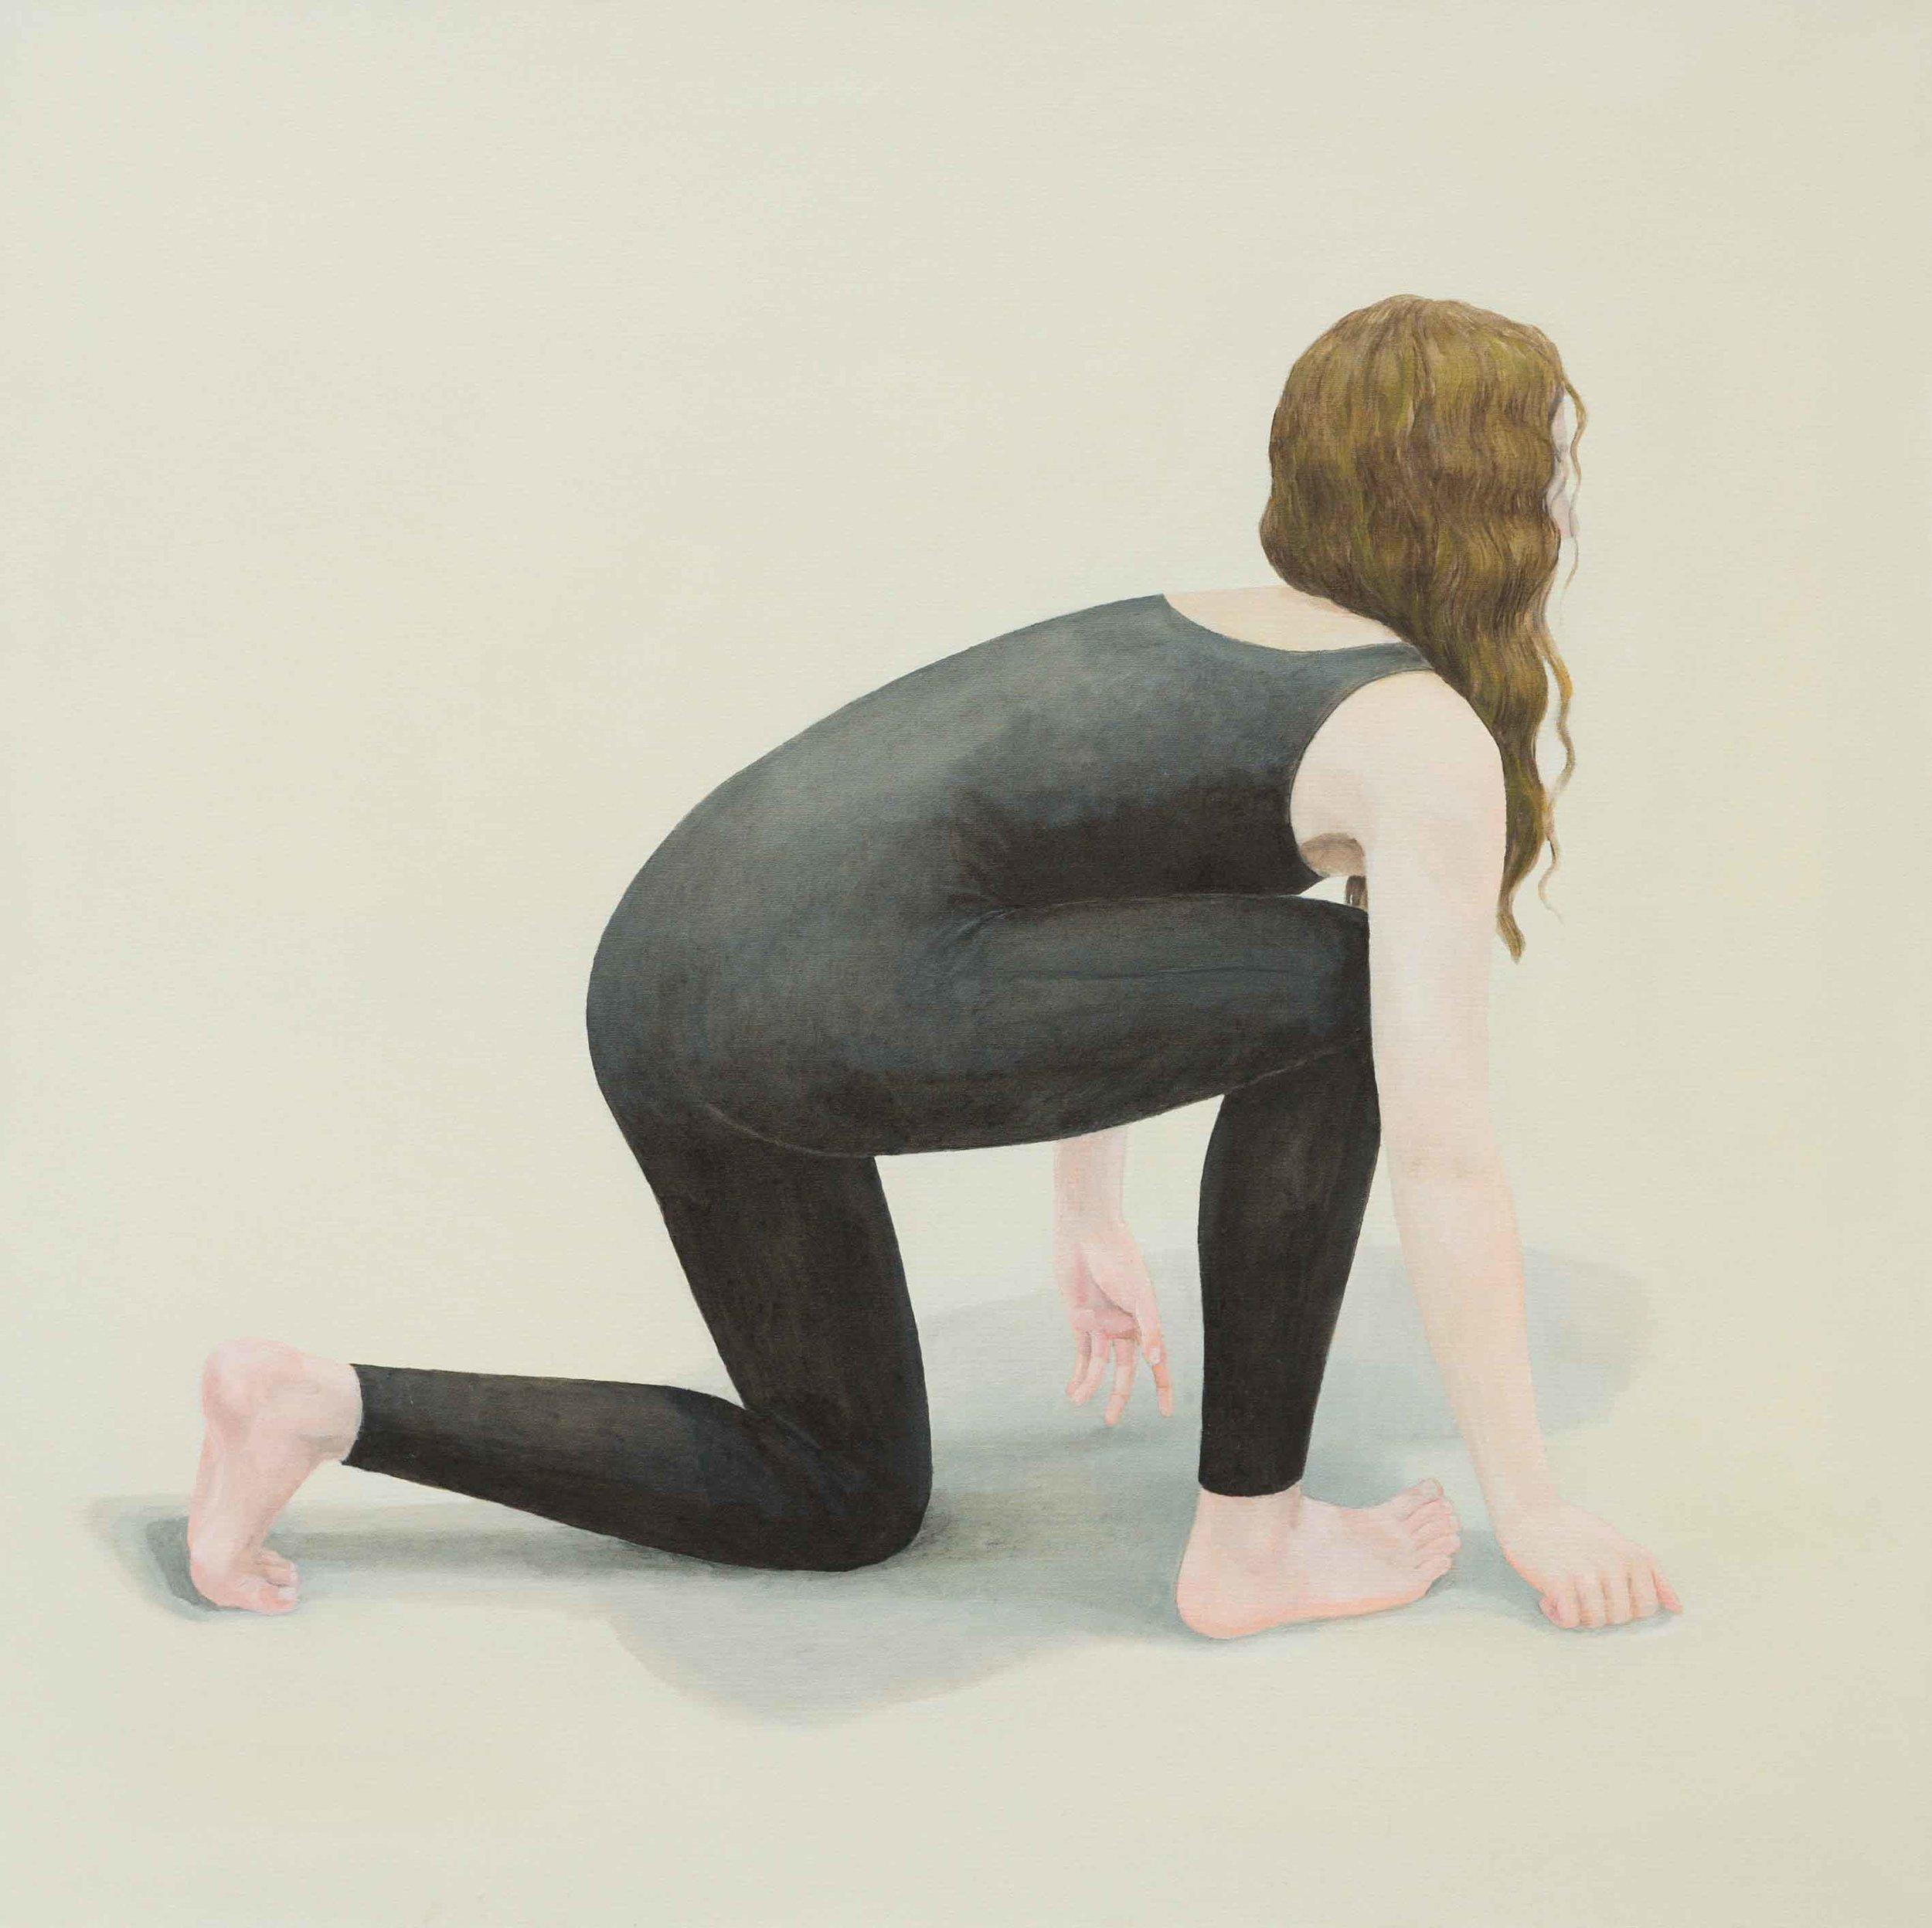 Escape 4, 120x120m cm, Oil on Canvas